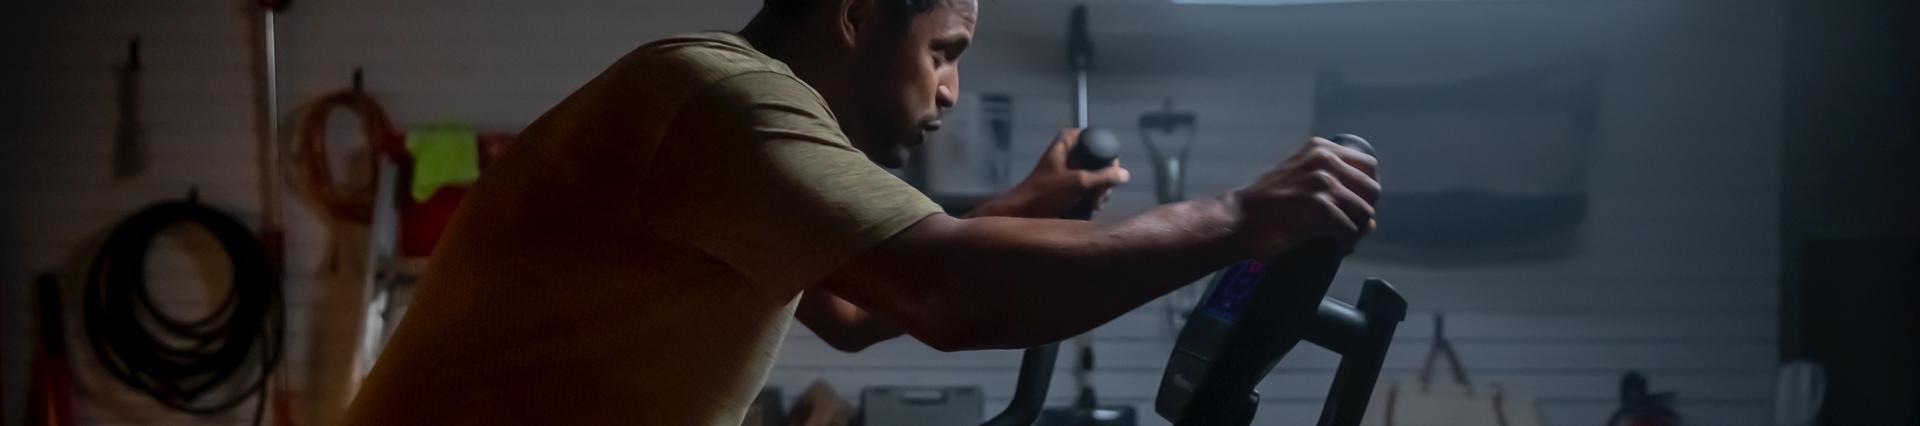 athletic man using a Bowflex Max Trainer